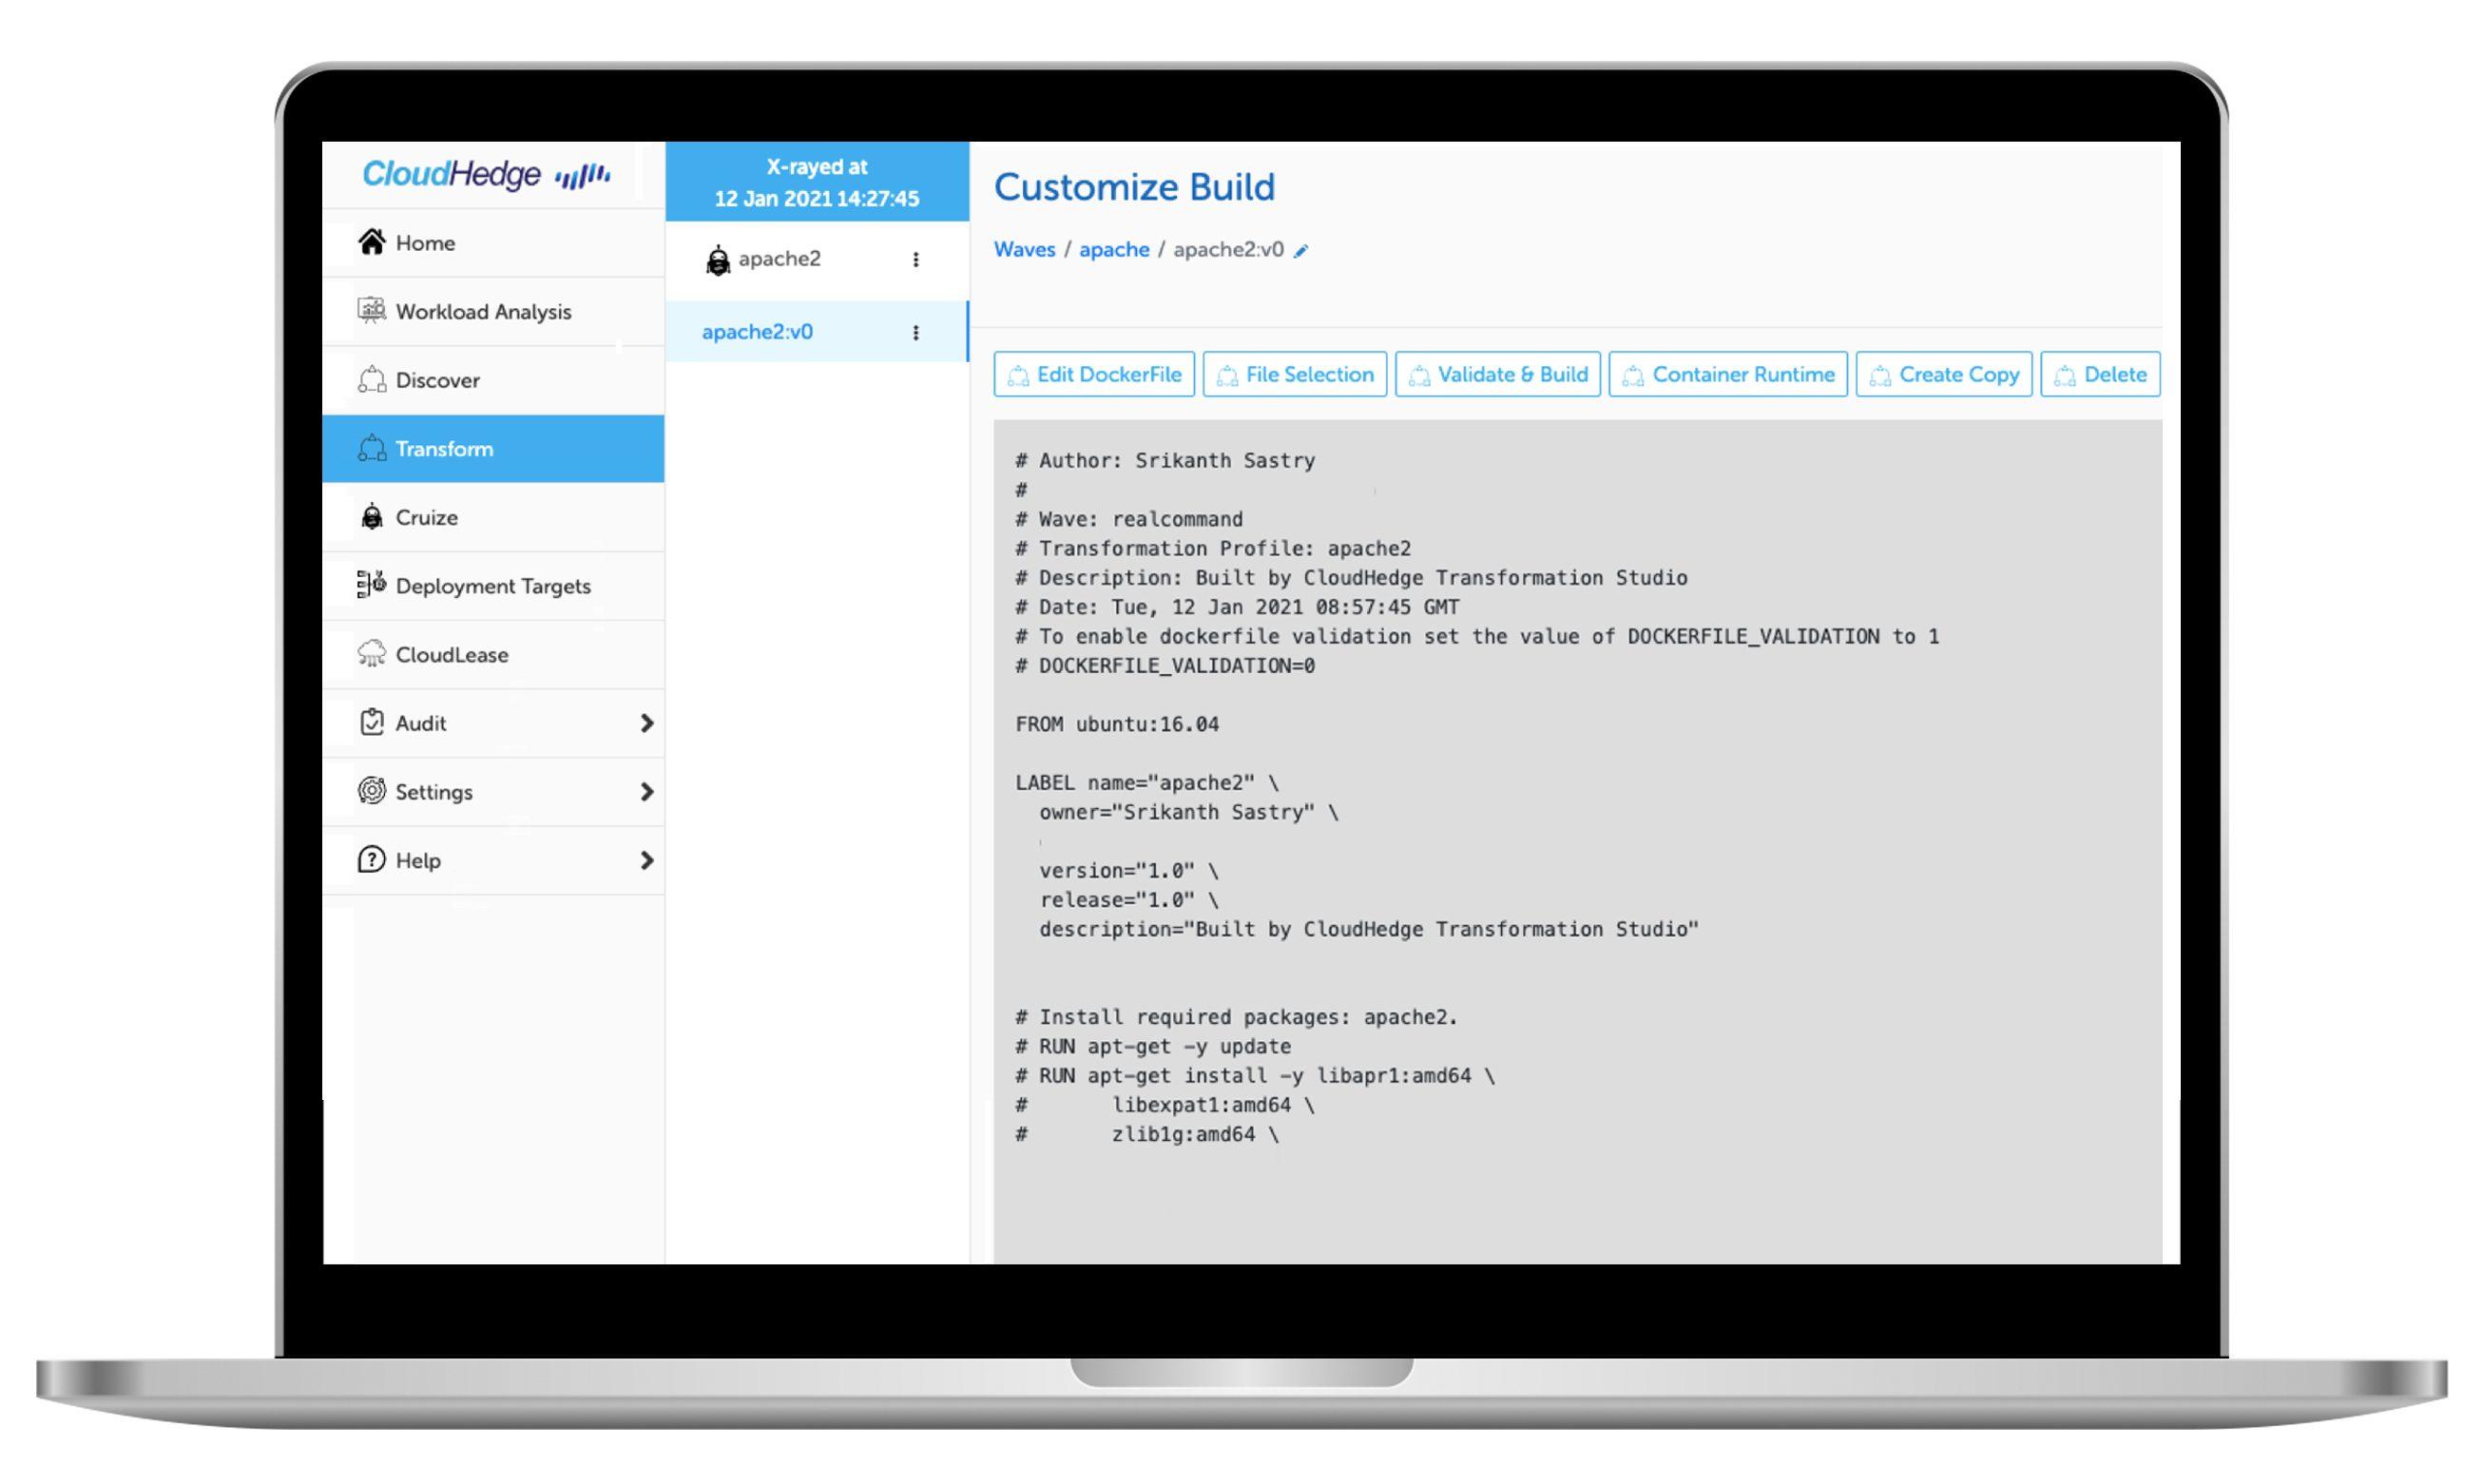 CloudHedge Customize Build